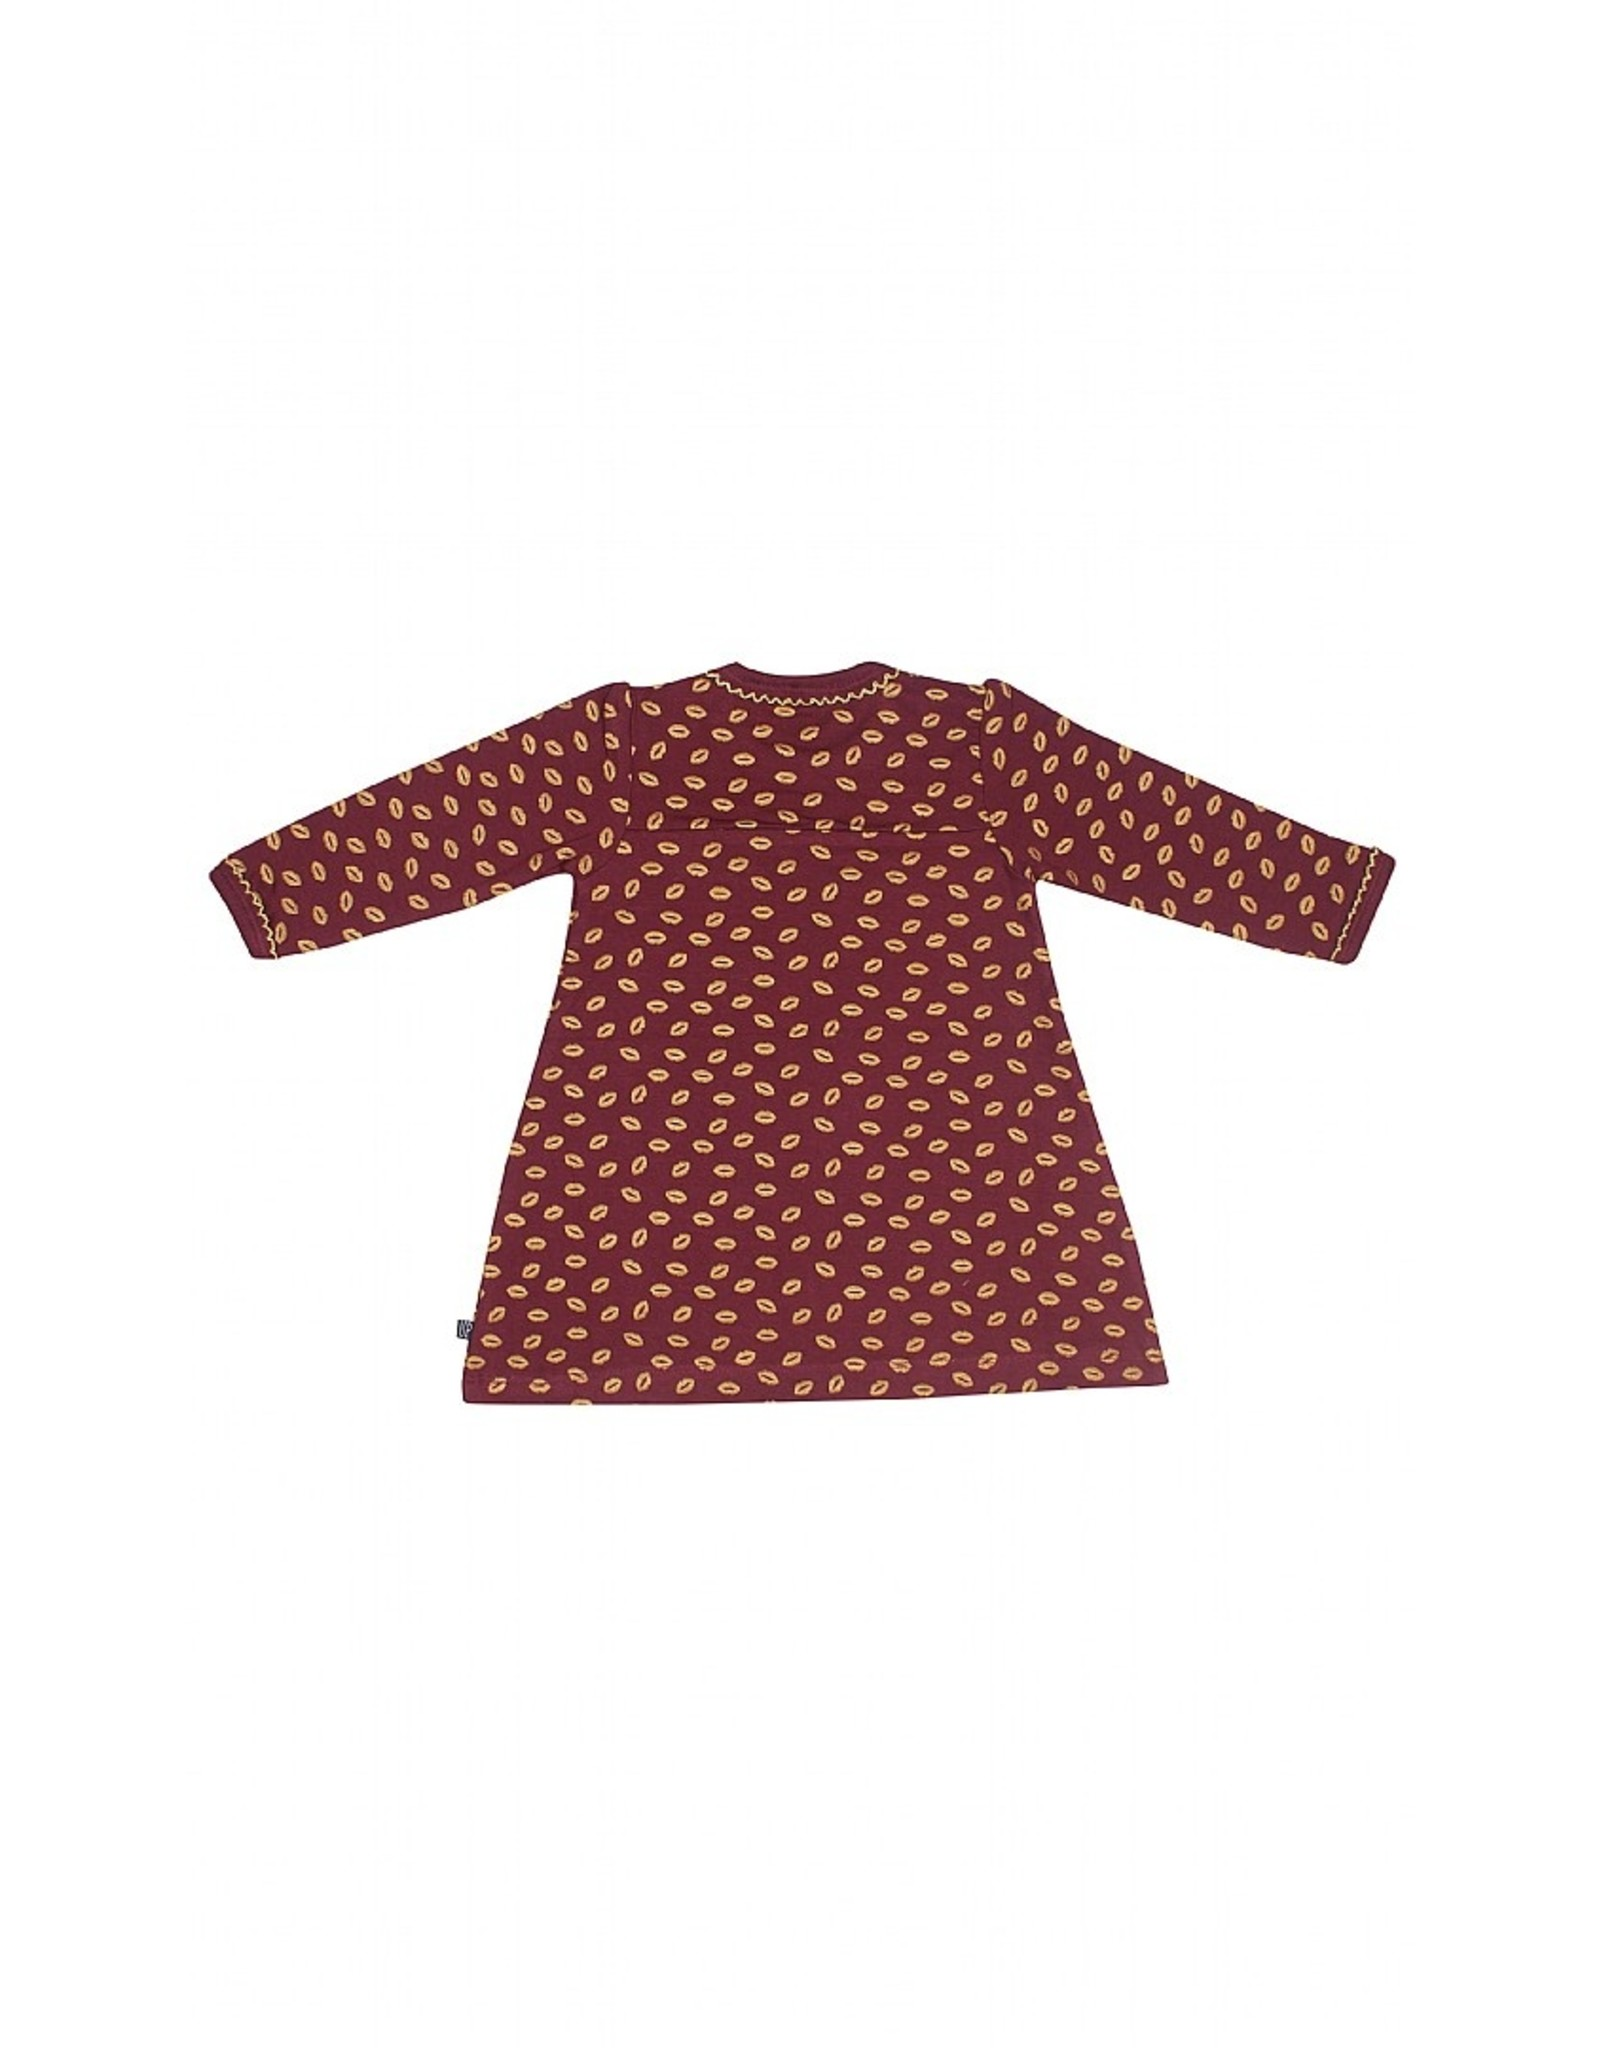 KIDS UP Kids Up Baby Dress Burgundy